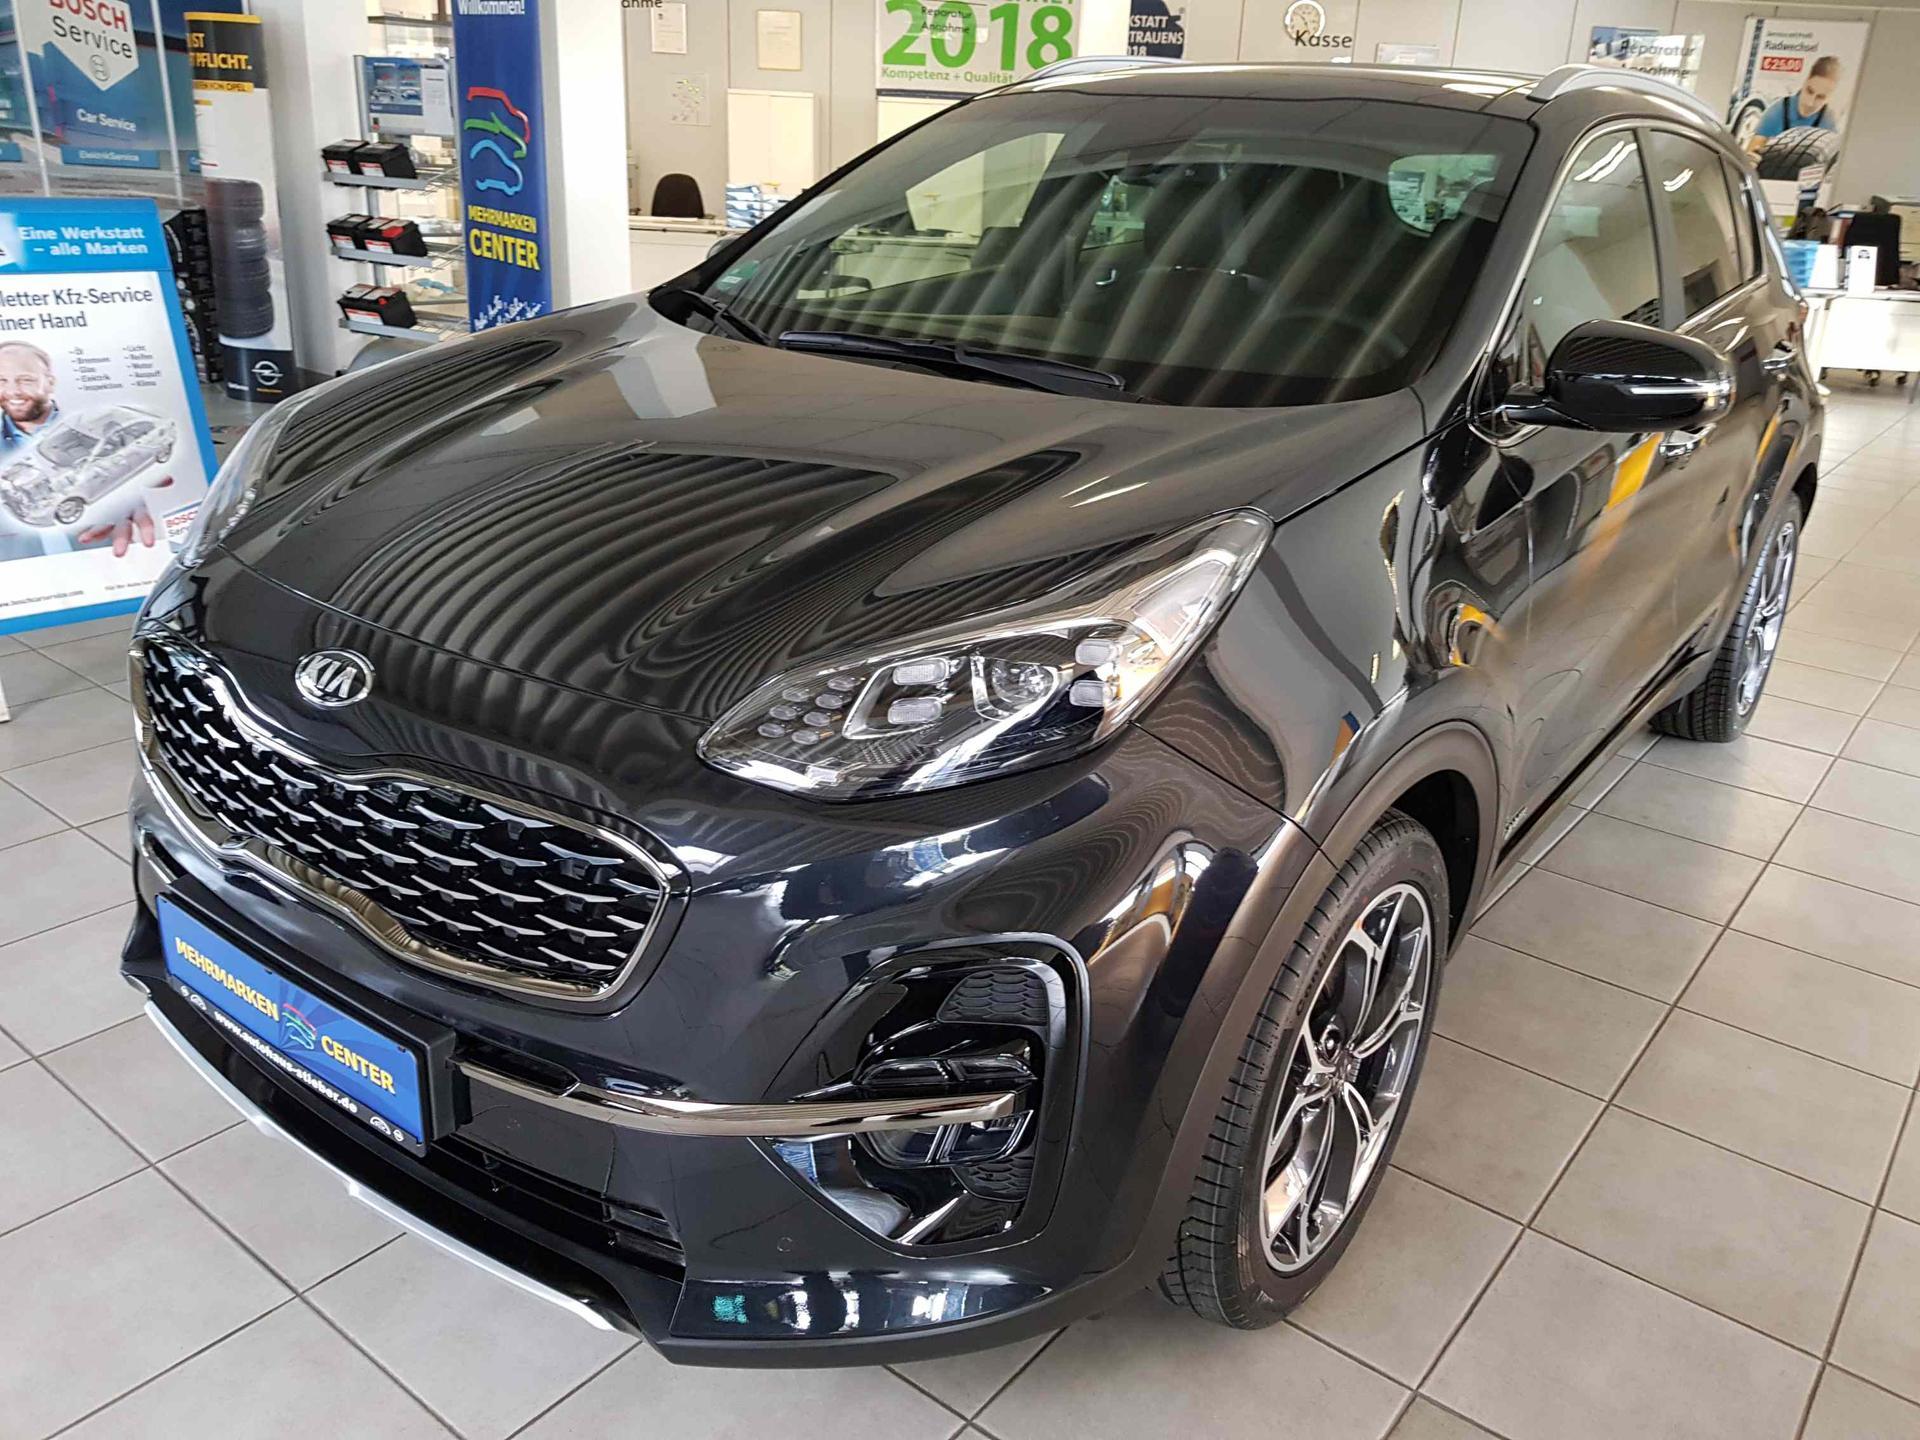 Kia Sportage Gt Plus Line 2019 Automatik Vollausstattung